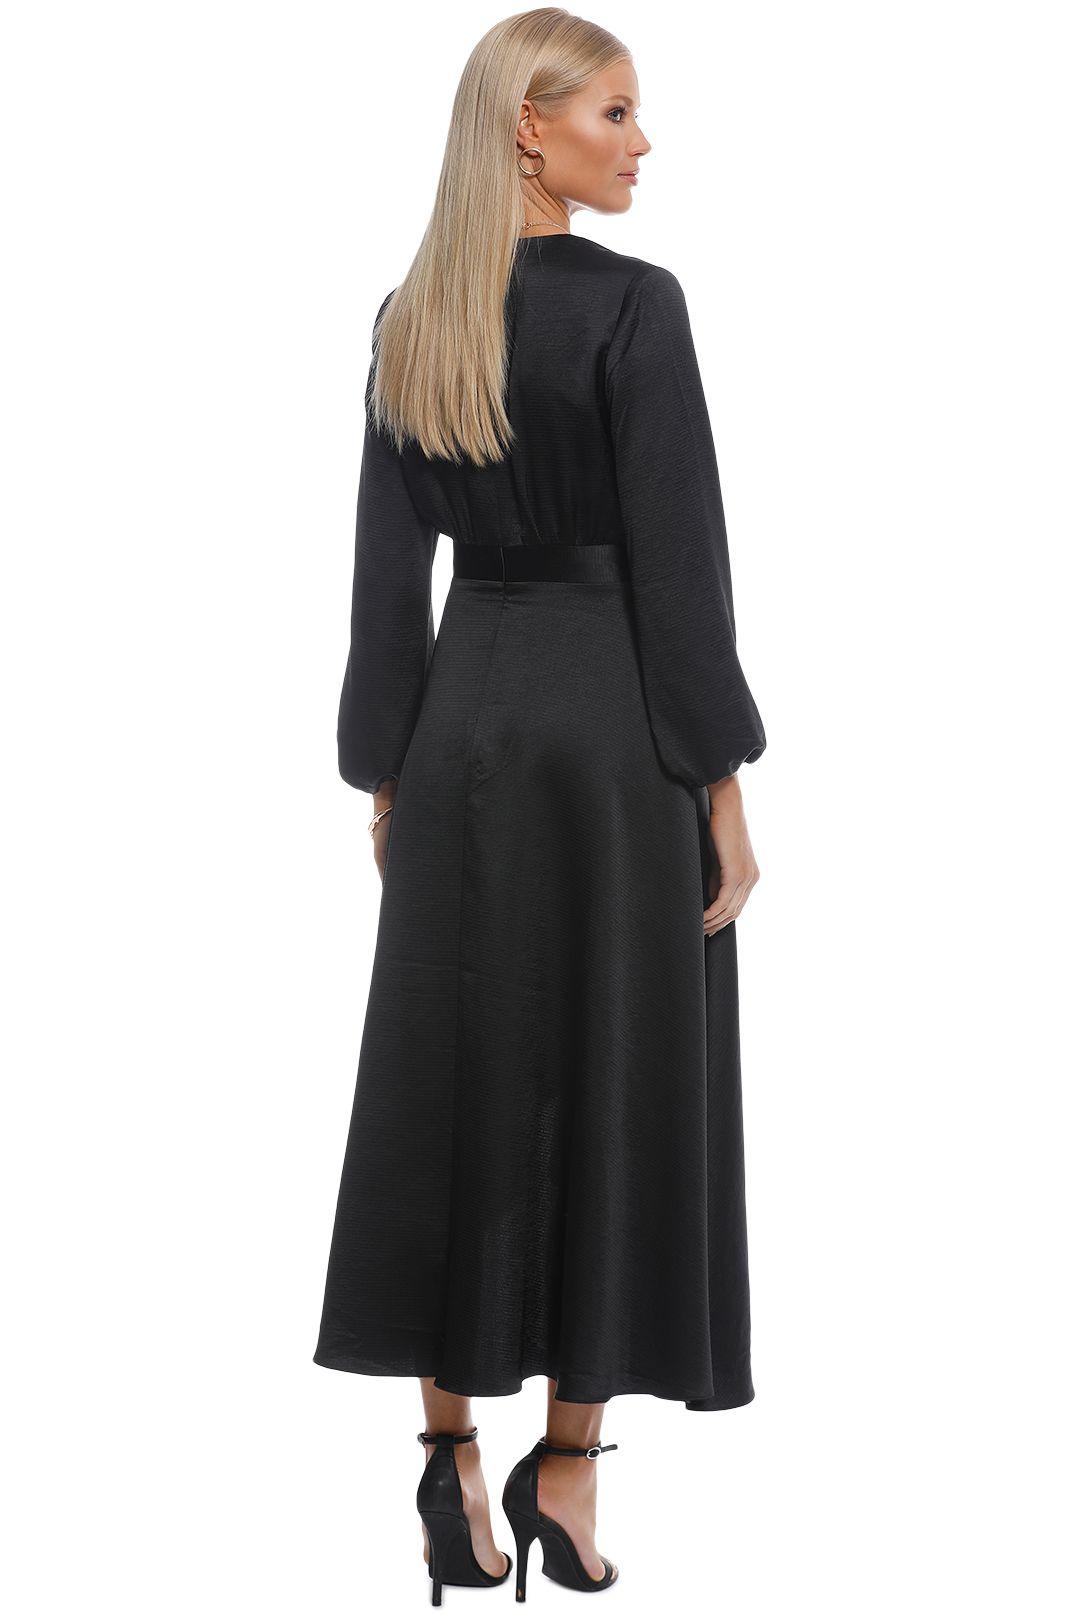 Pasduchas - Mercury Midi Dress - Black - Back